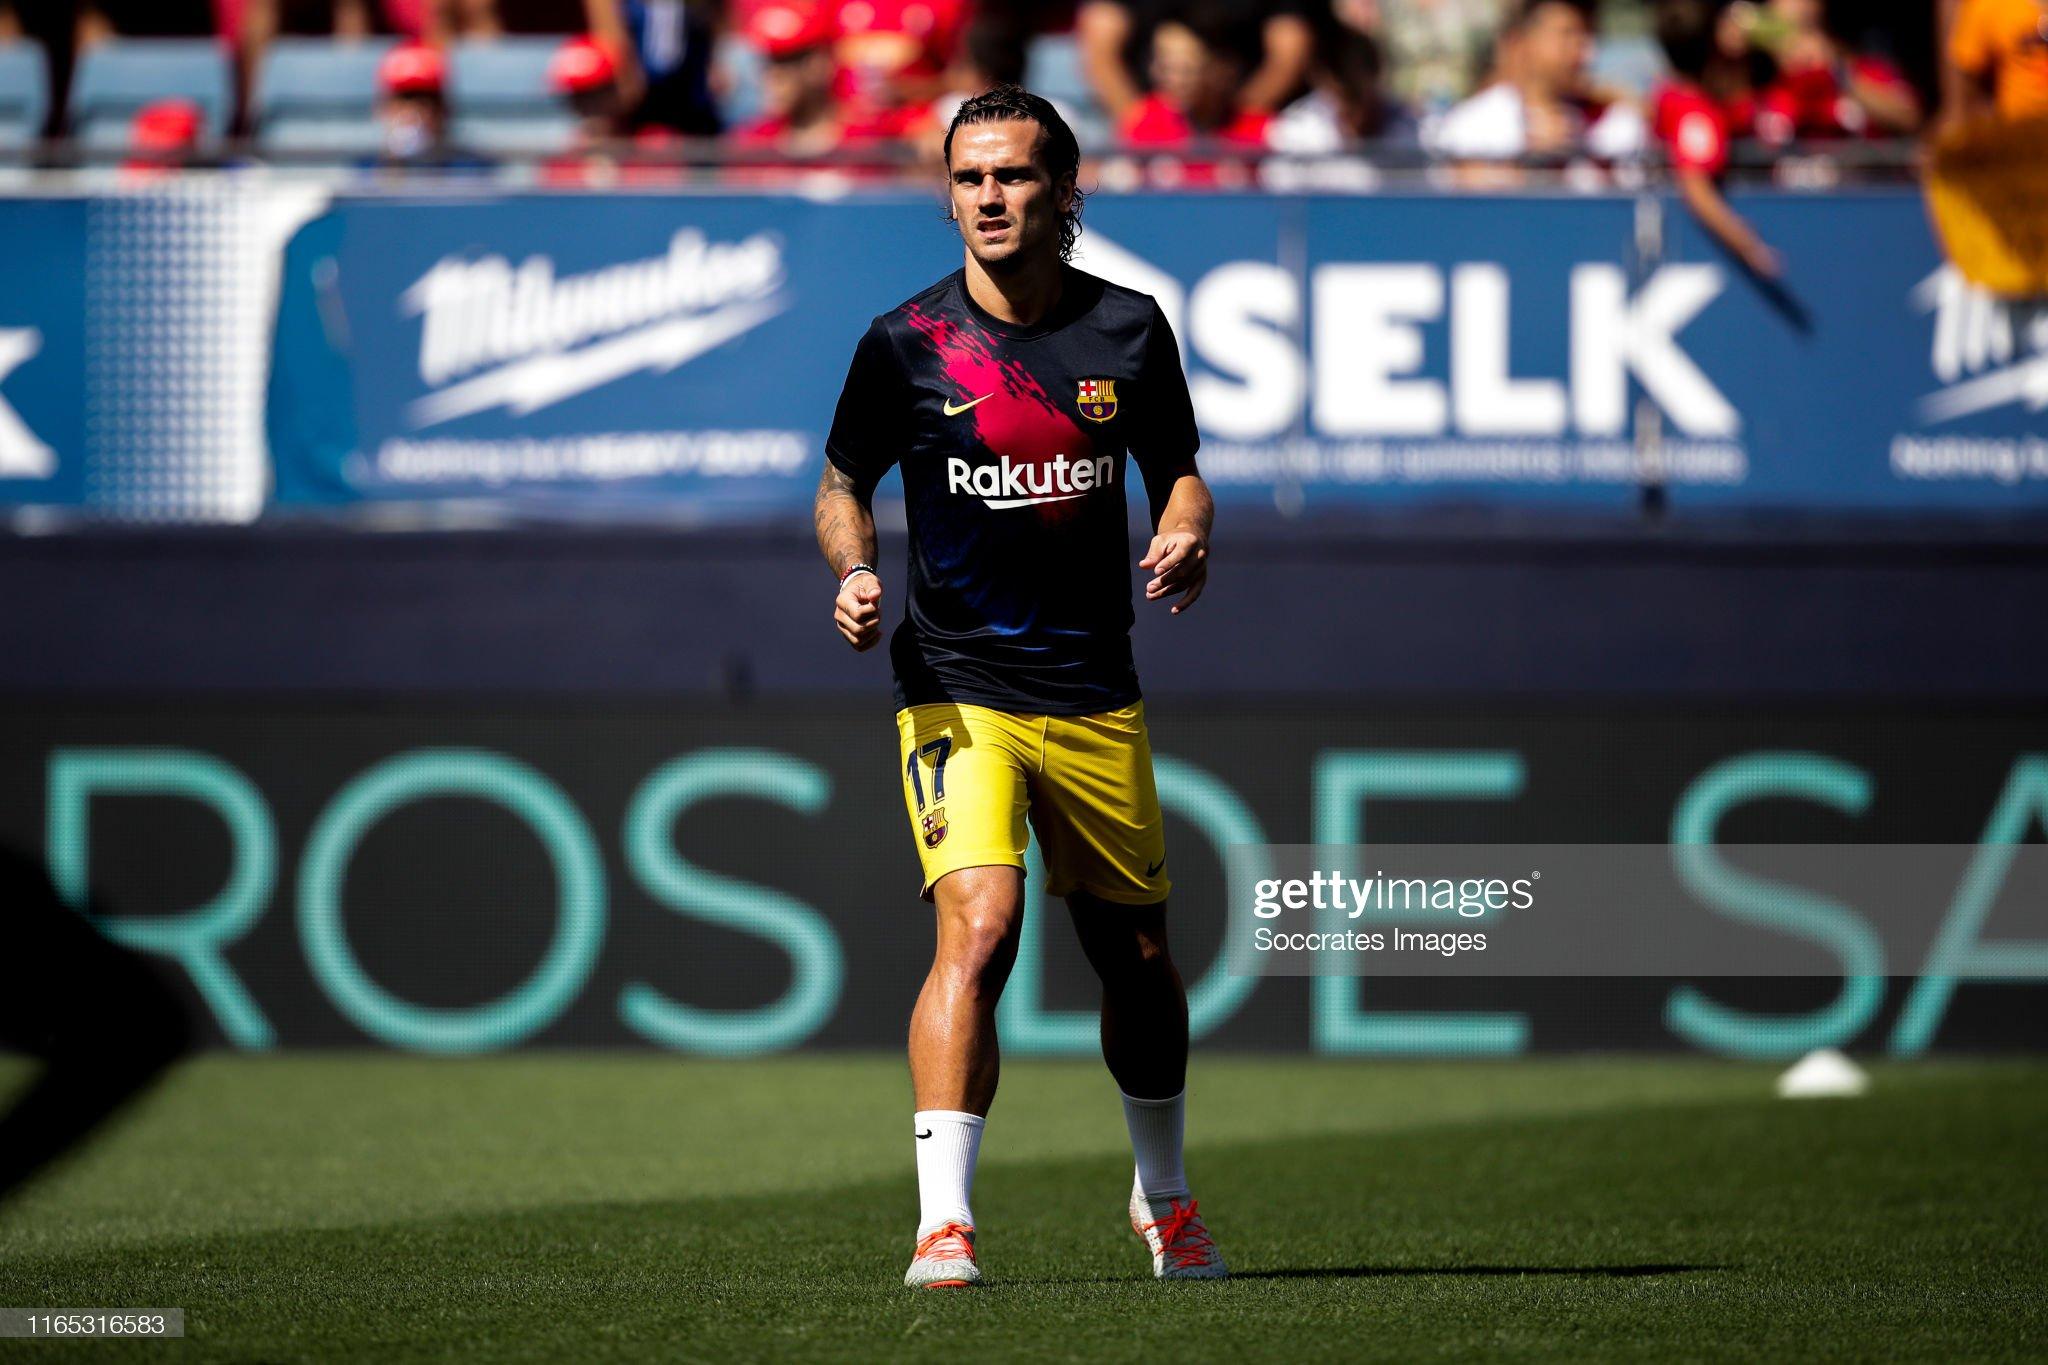 صور مباراة : أوساسونا - برشلونة 2-2 ( 31-08-2019 )  Antoine-griezmann-of-fc-barcelona-during-the-la-liga-santander-match-picture-id1165316583?s=2048x2048